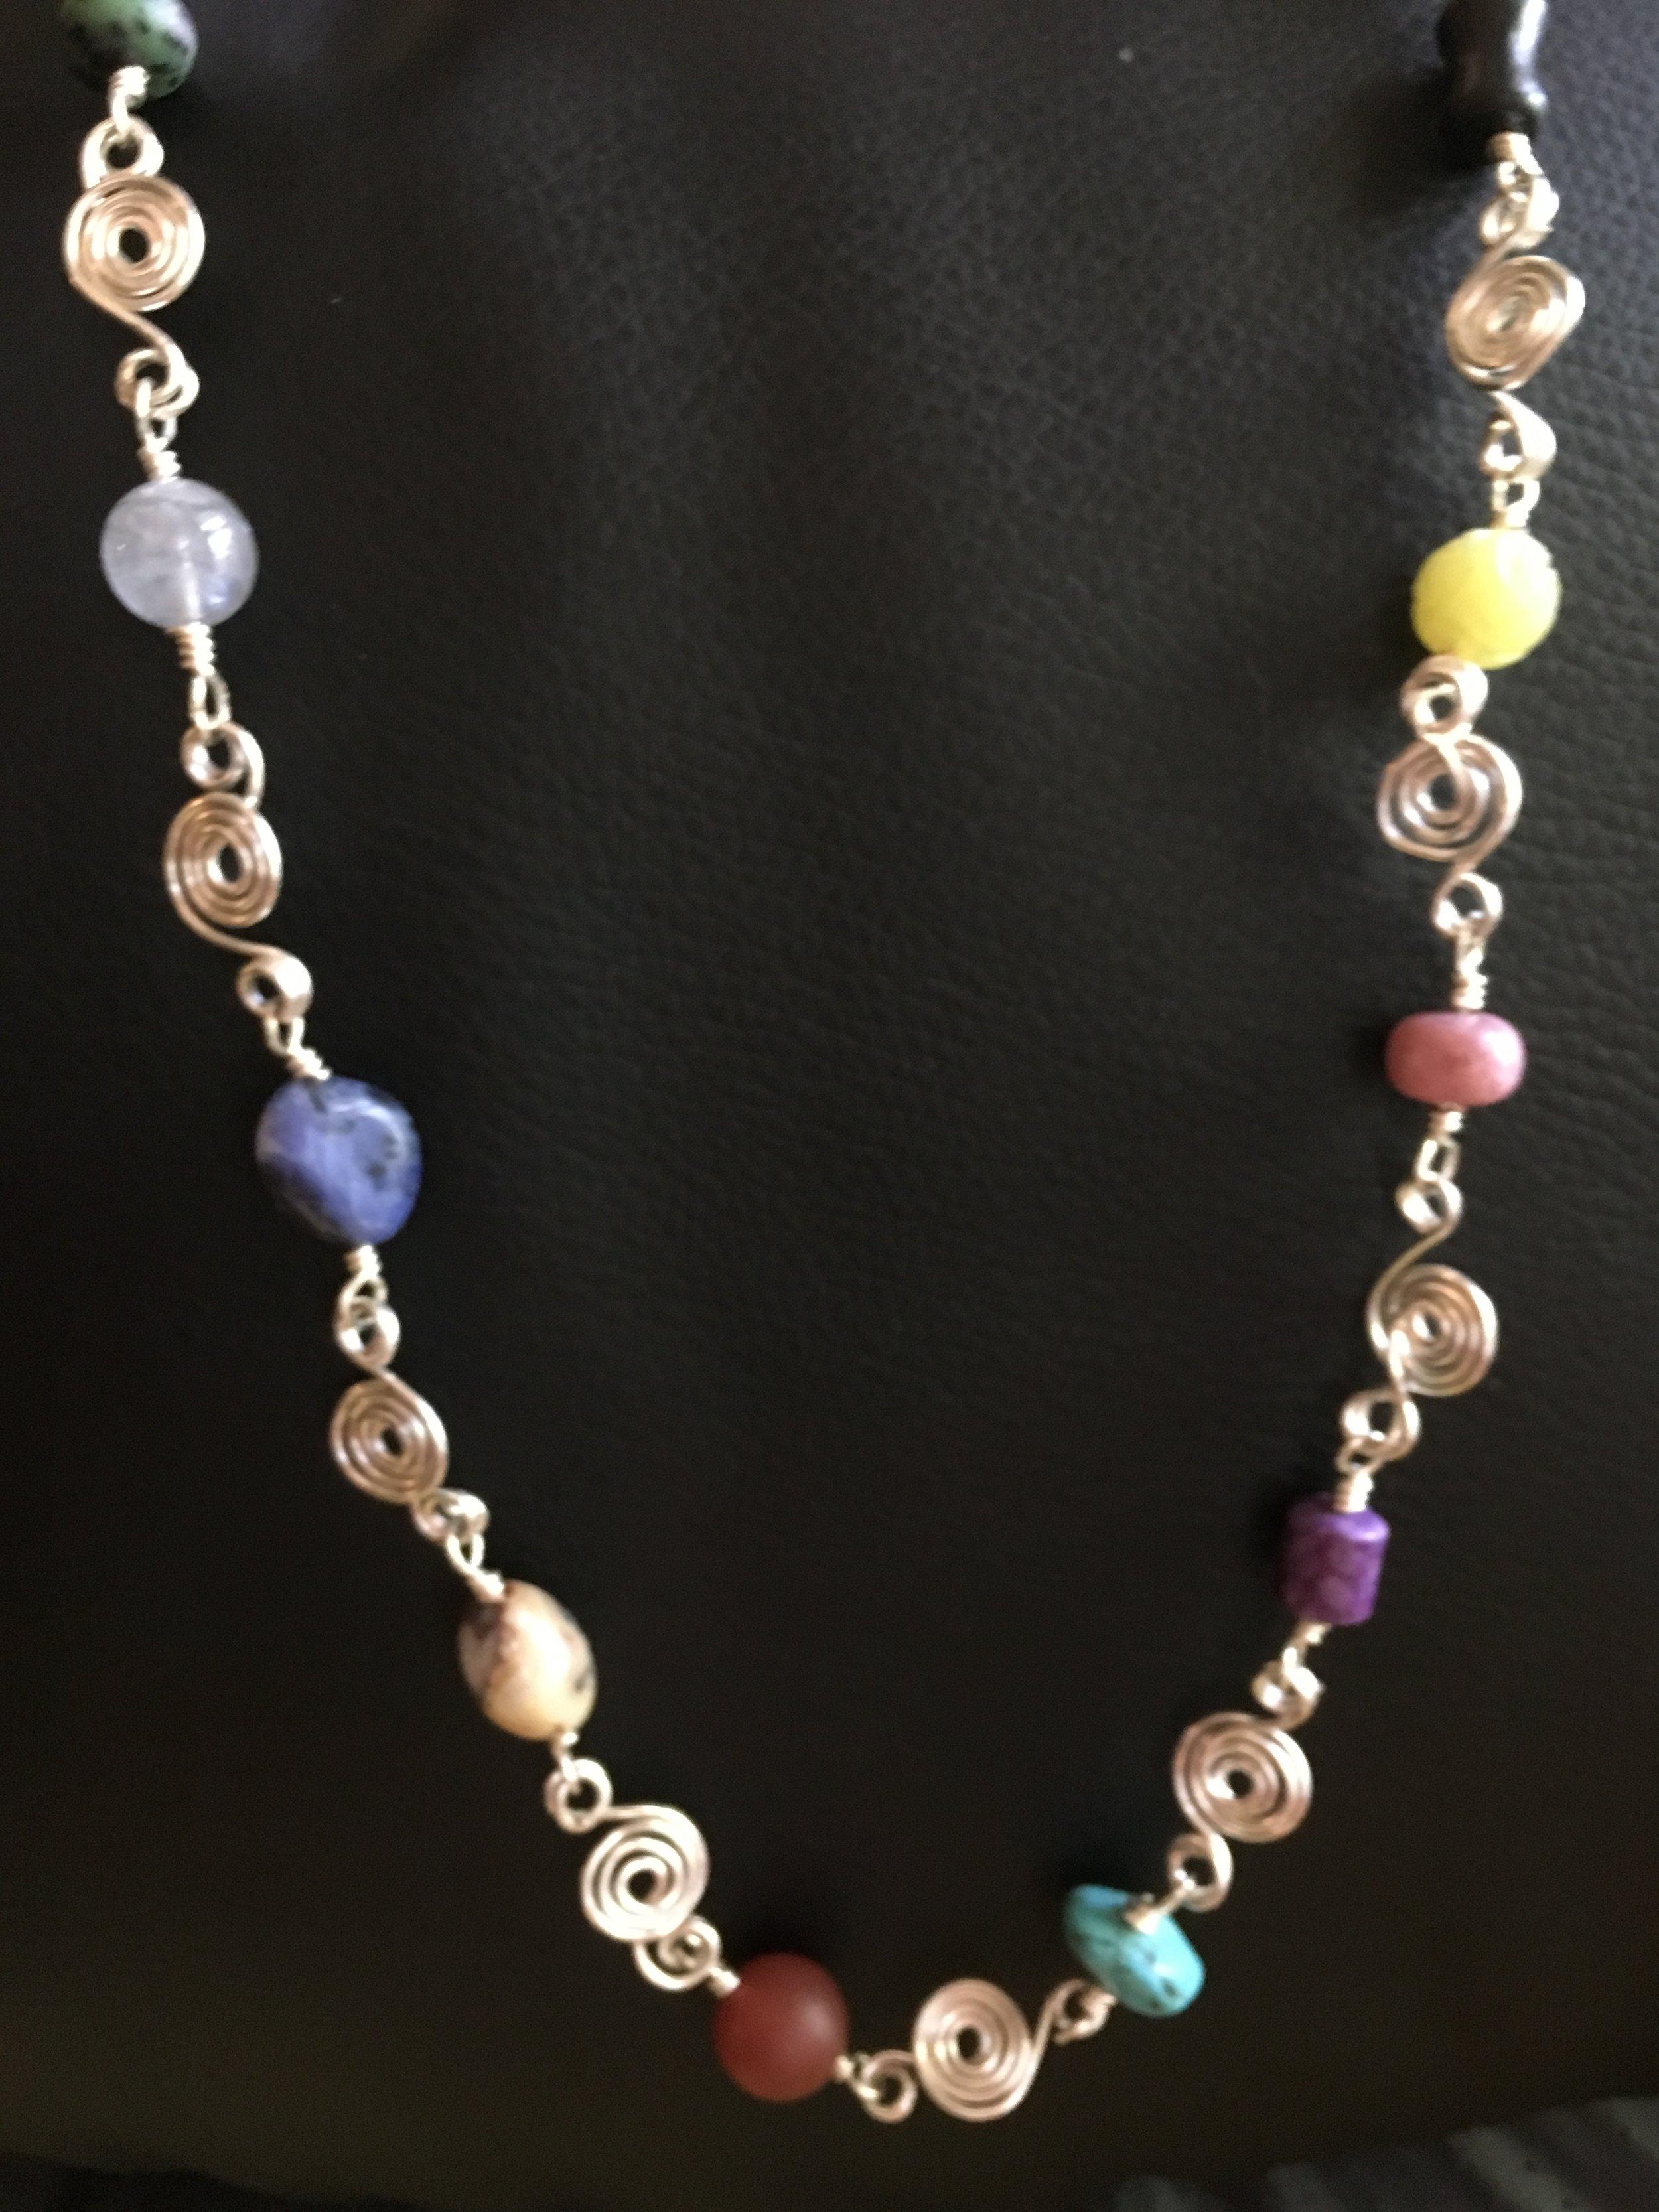 necklace3.jpeg